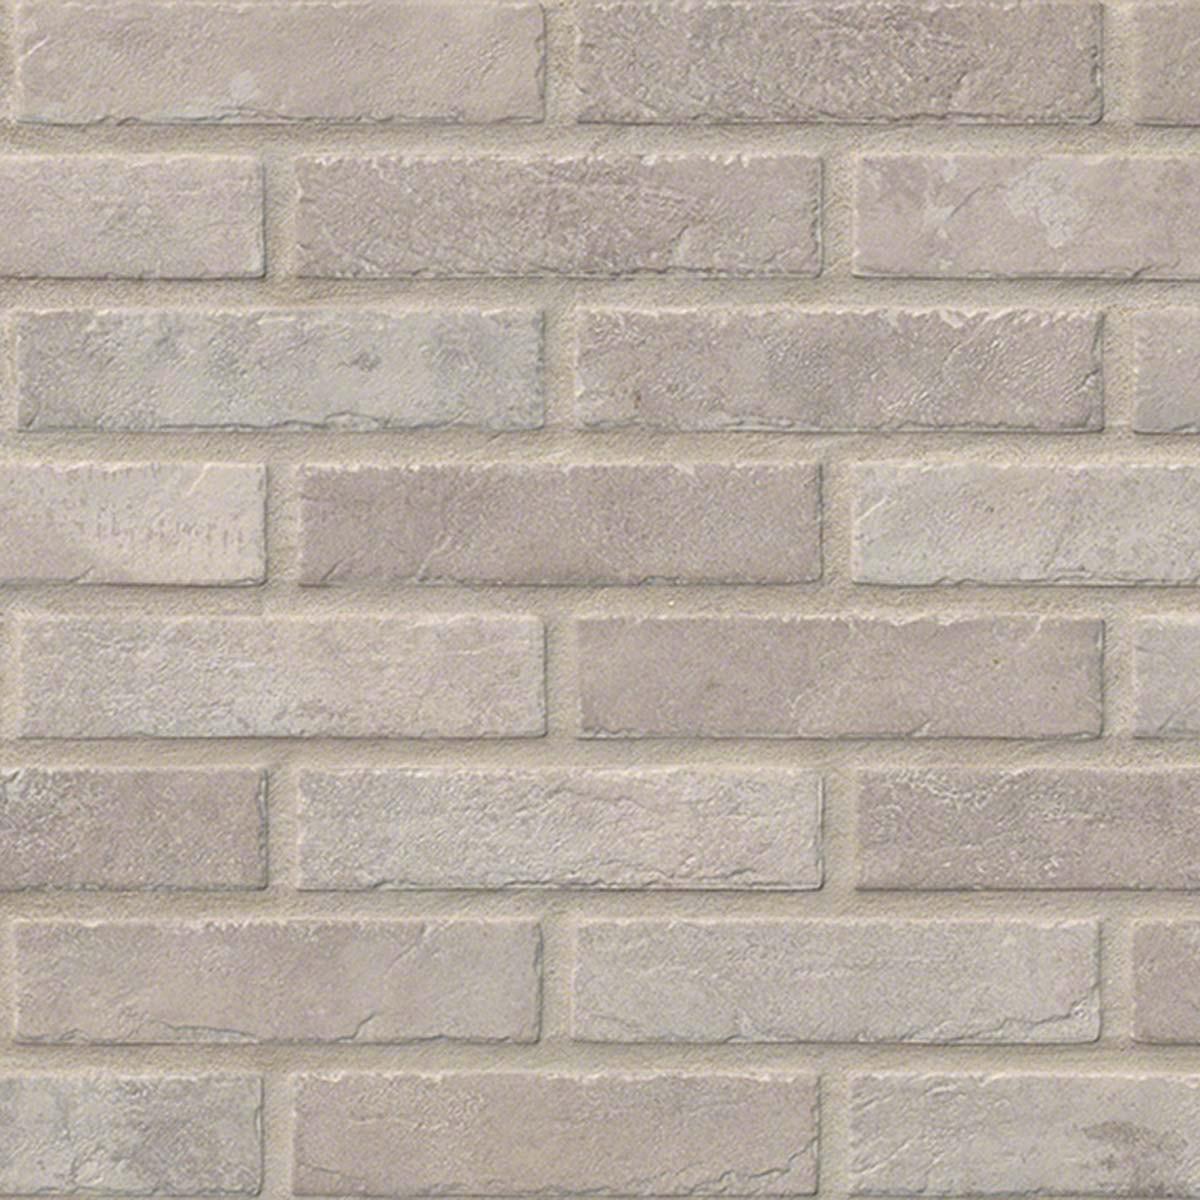 Brickstone Ivory 2x10 Tiles Direct Store